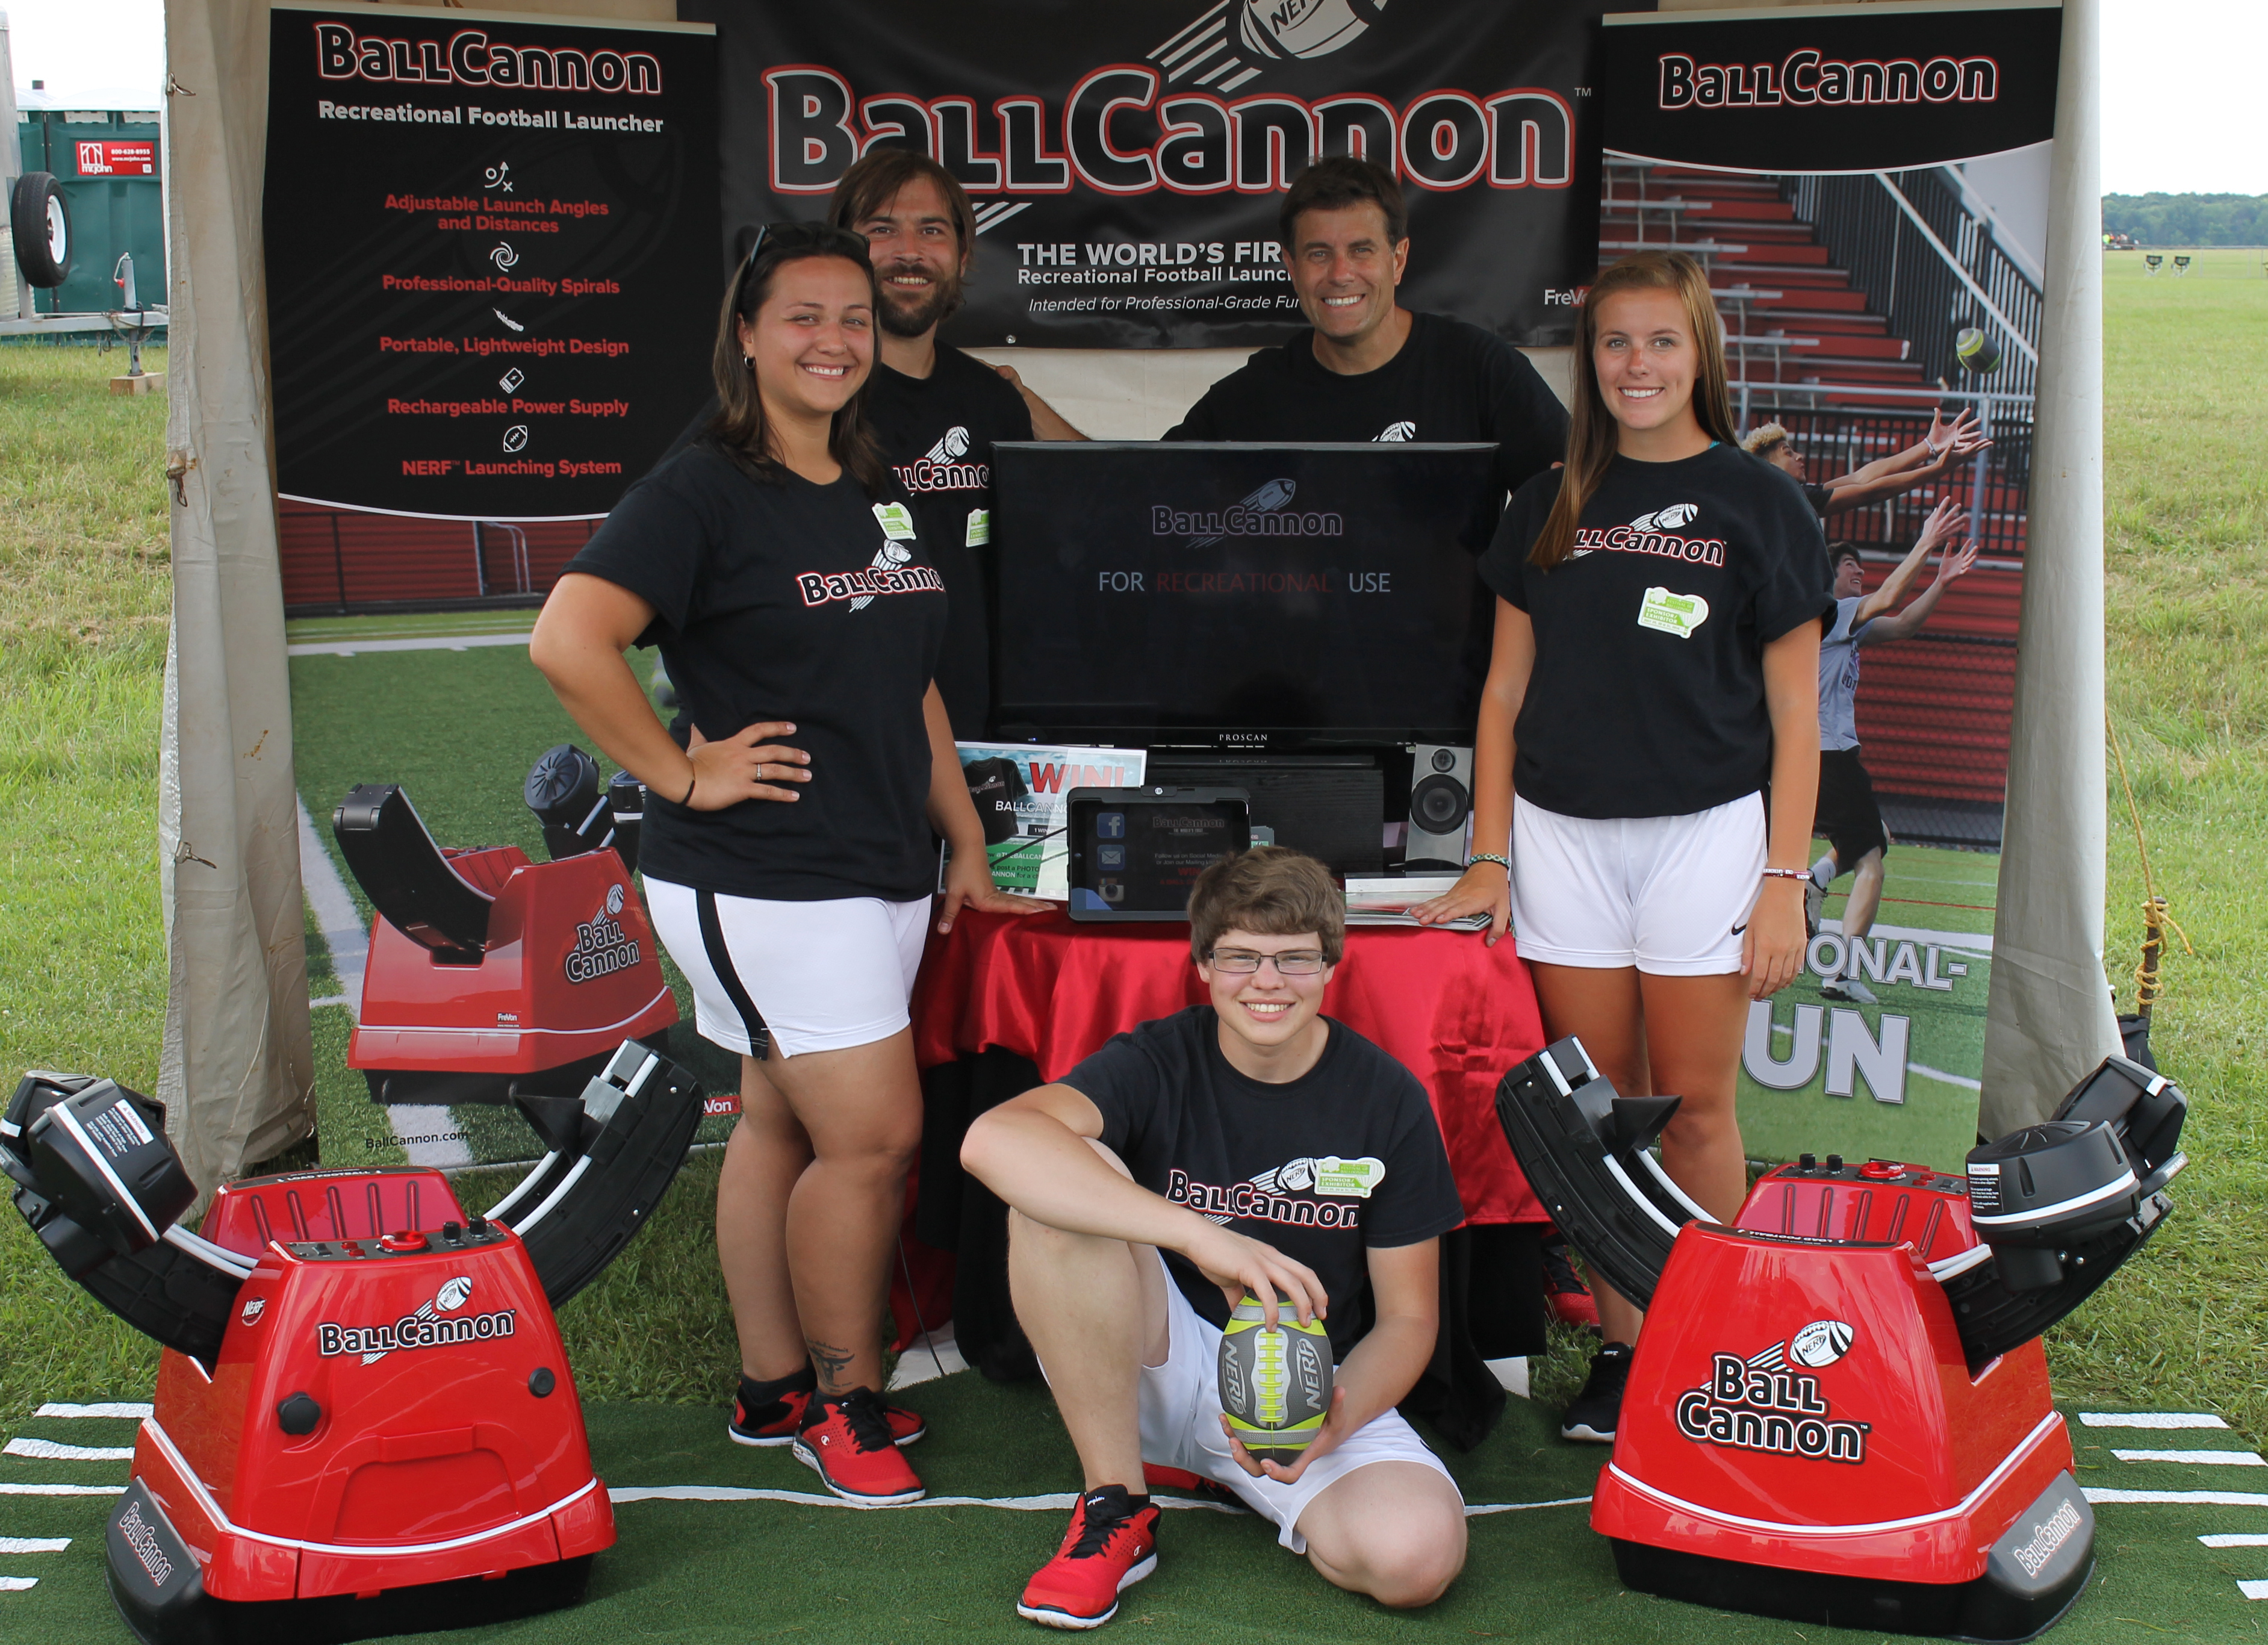 Ball Cannon Team